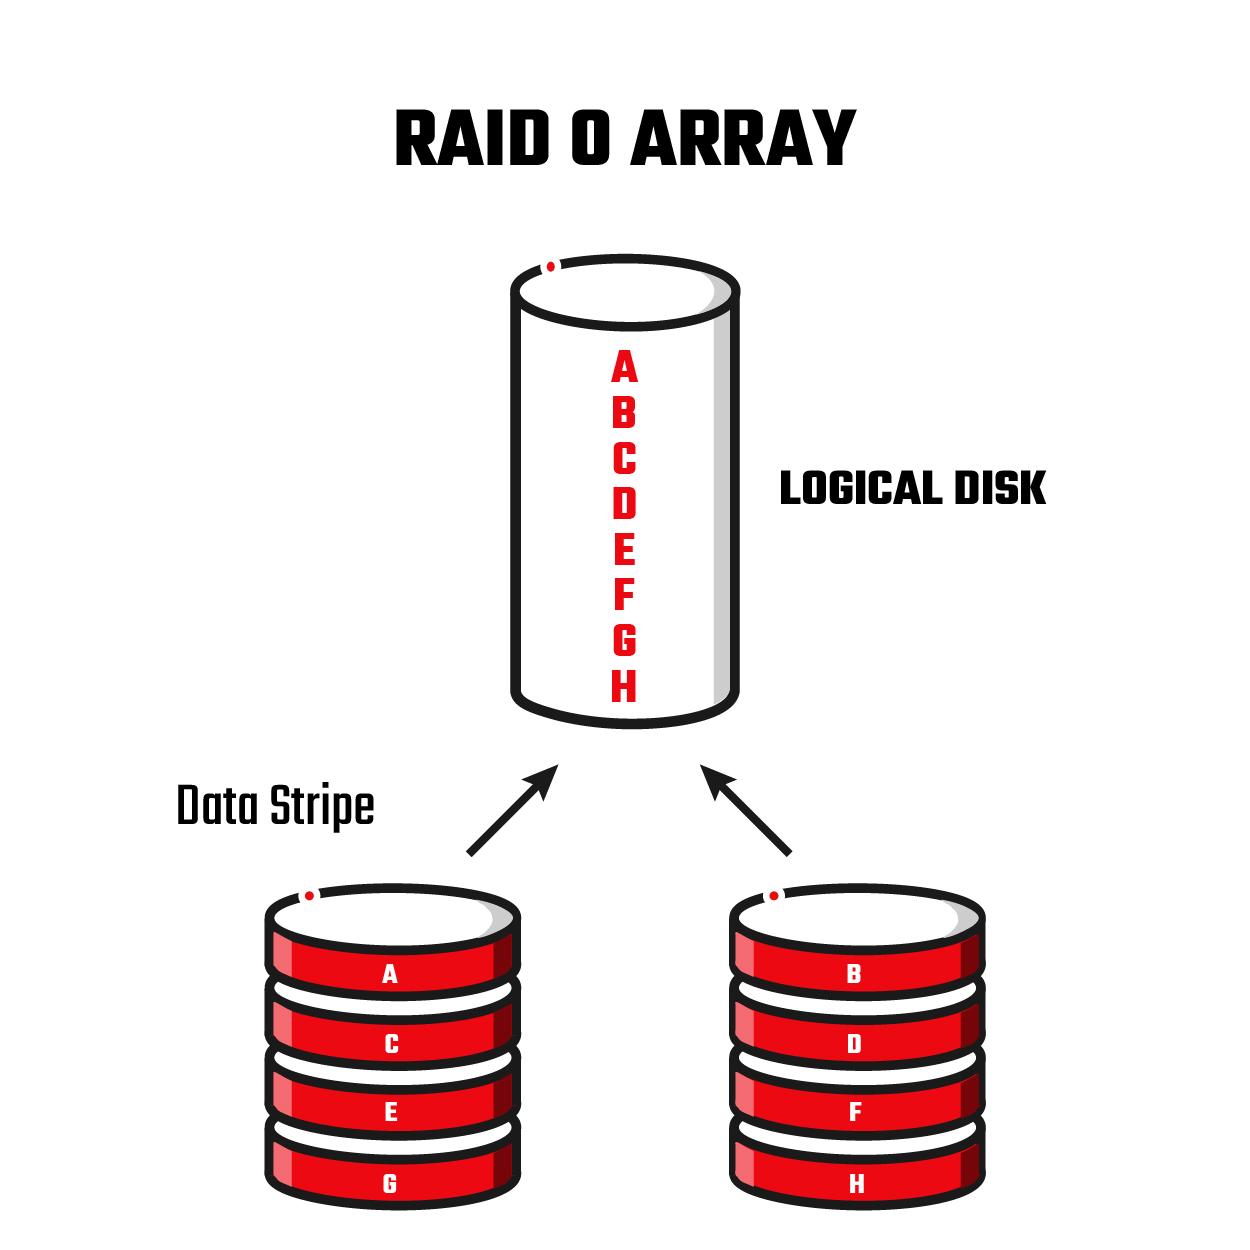 Raid 0 Array